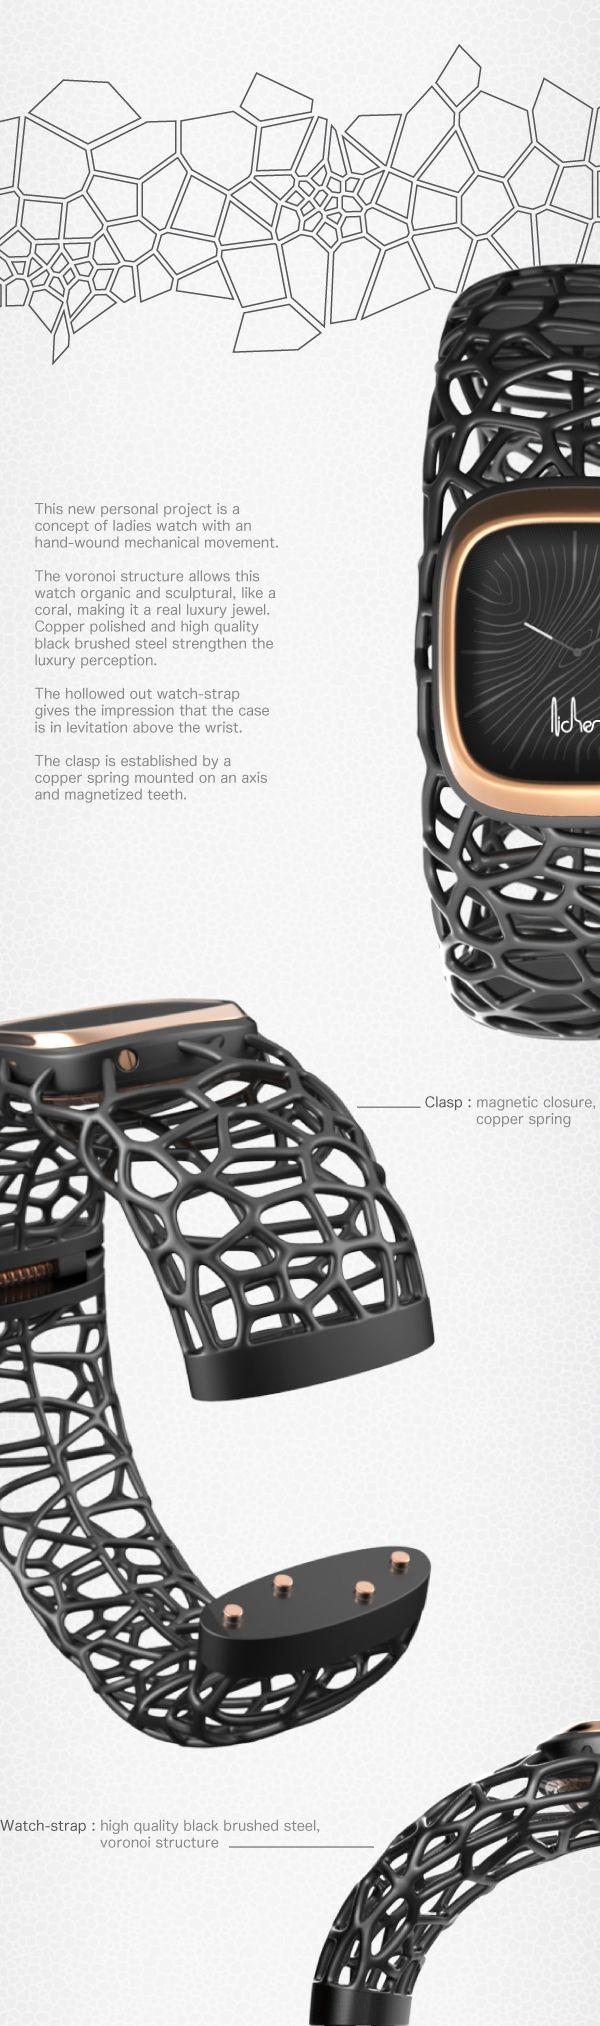 3d프린터로 만들수있는 와치밴드. 사용자 각각이 원하는 디자인으로 다양하게 제작할수있다. 앞으로 이런방식의 디자인이 점점 많이 생길것같다.